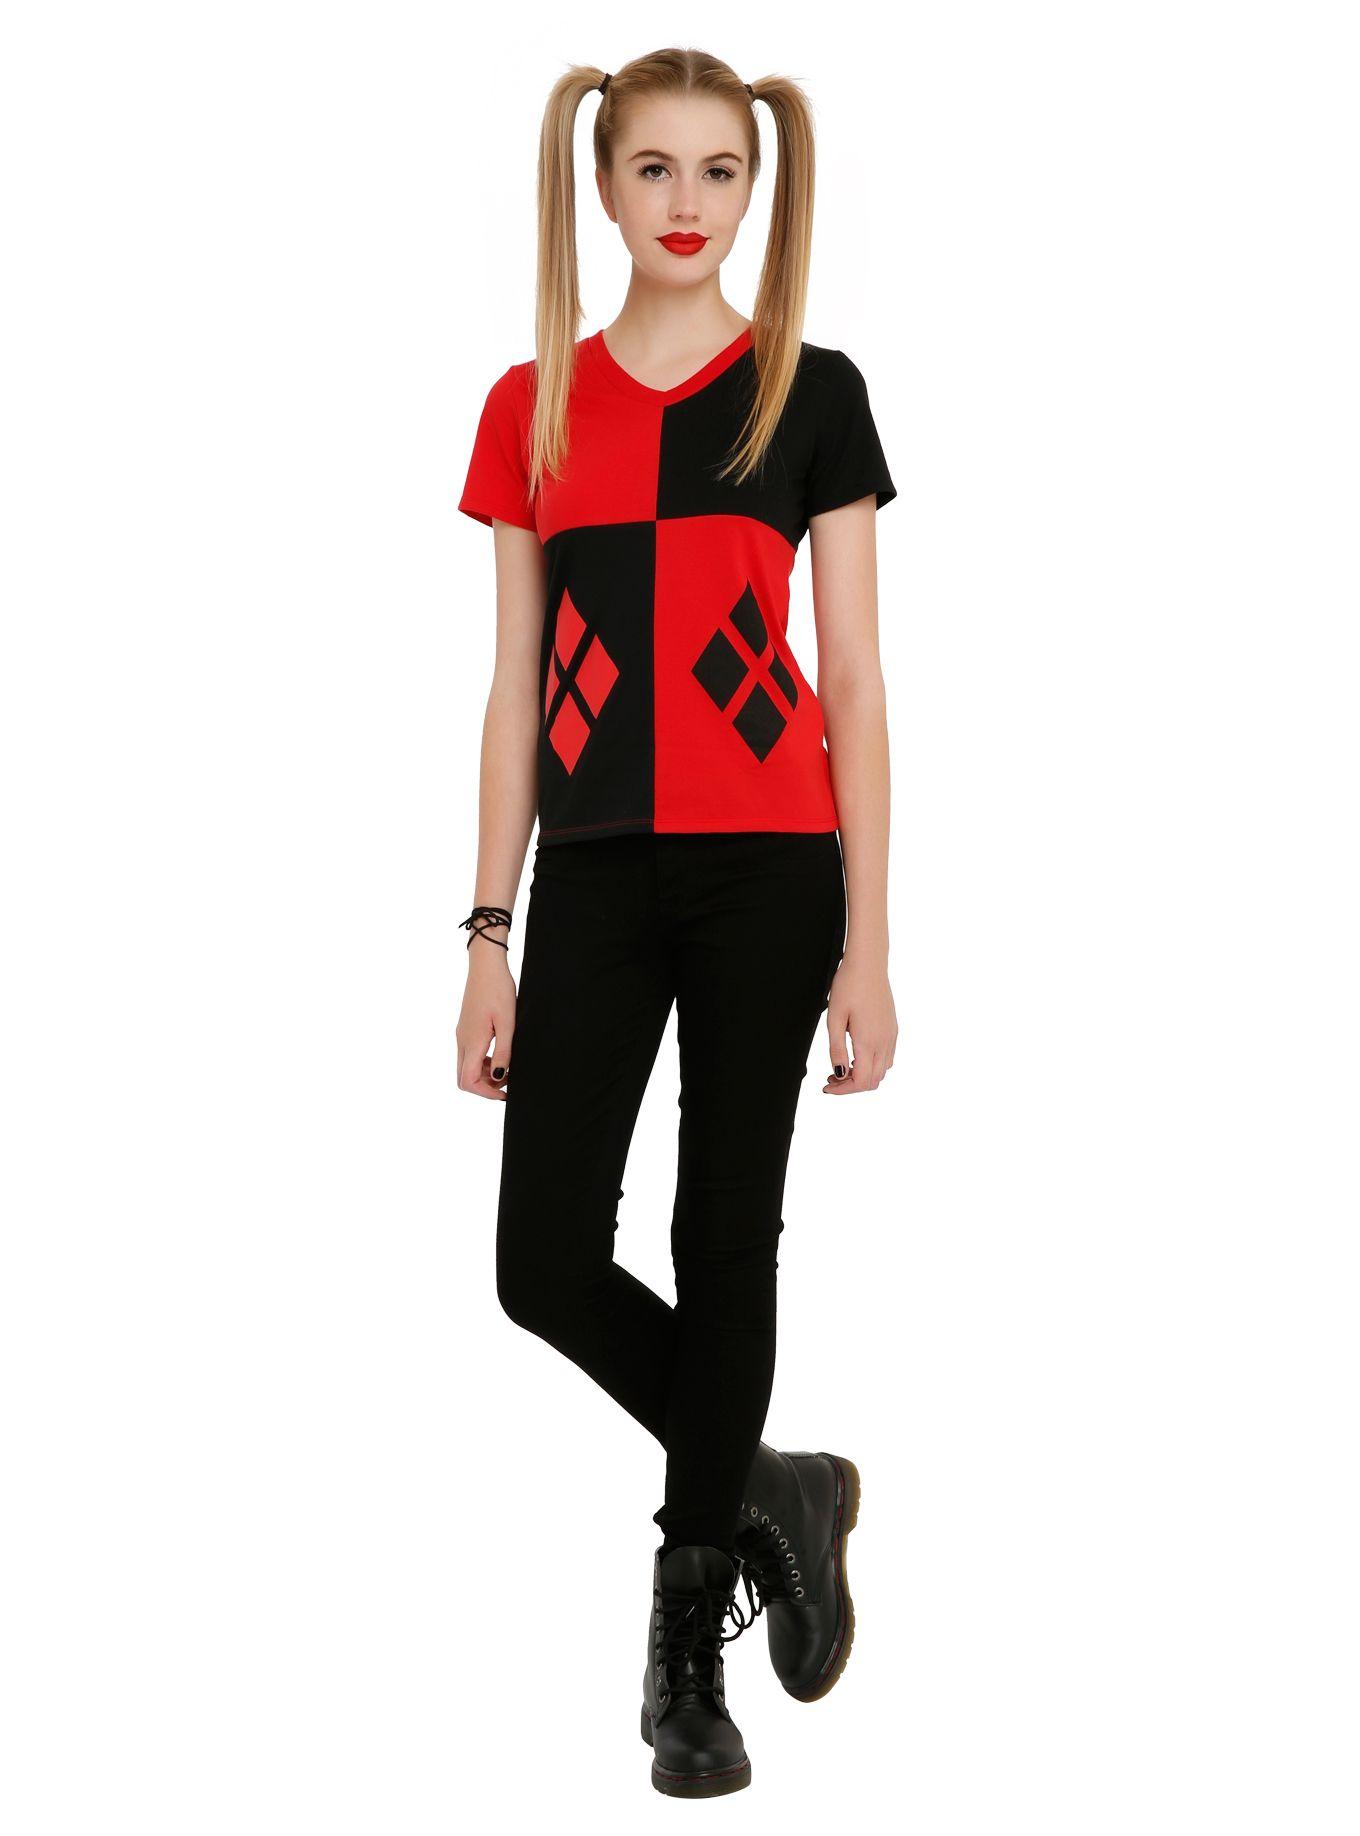 5979ba7e1c3a DC Comics Harley Quinn Girls Costume T-Shirt